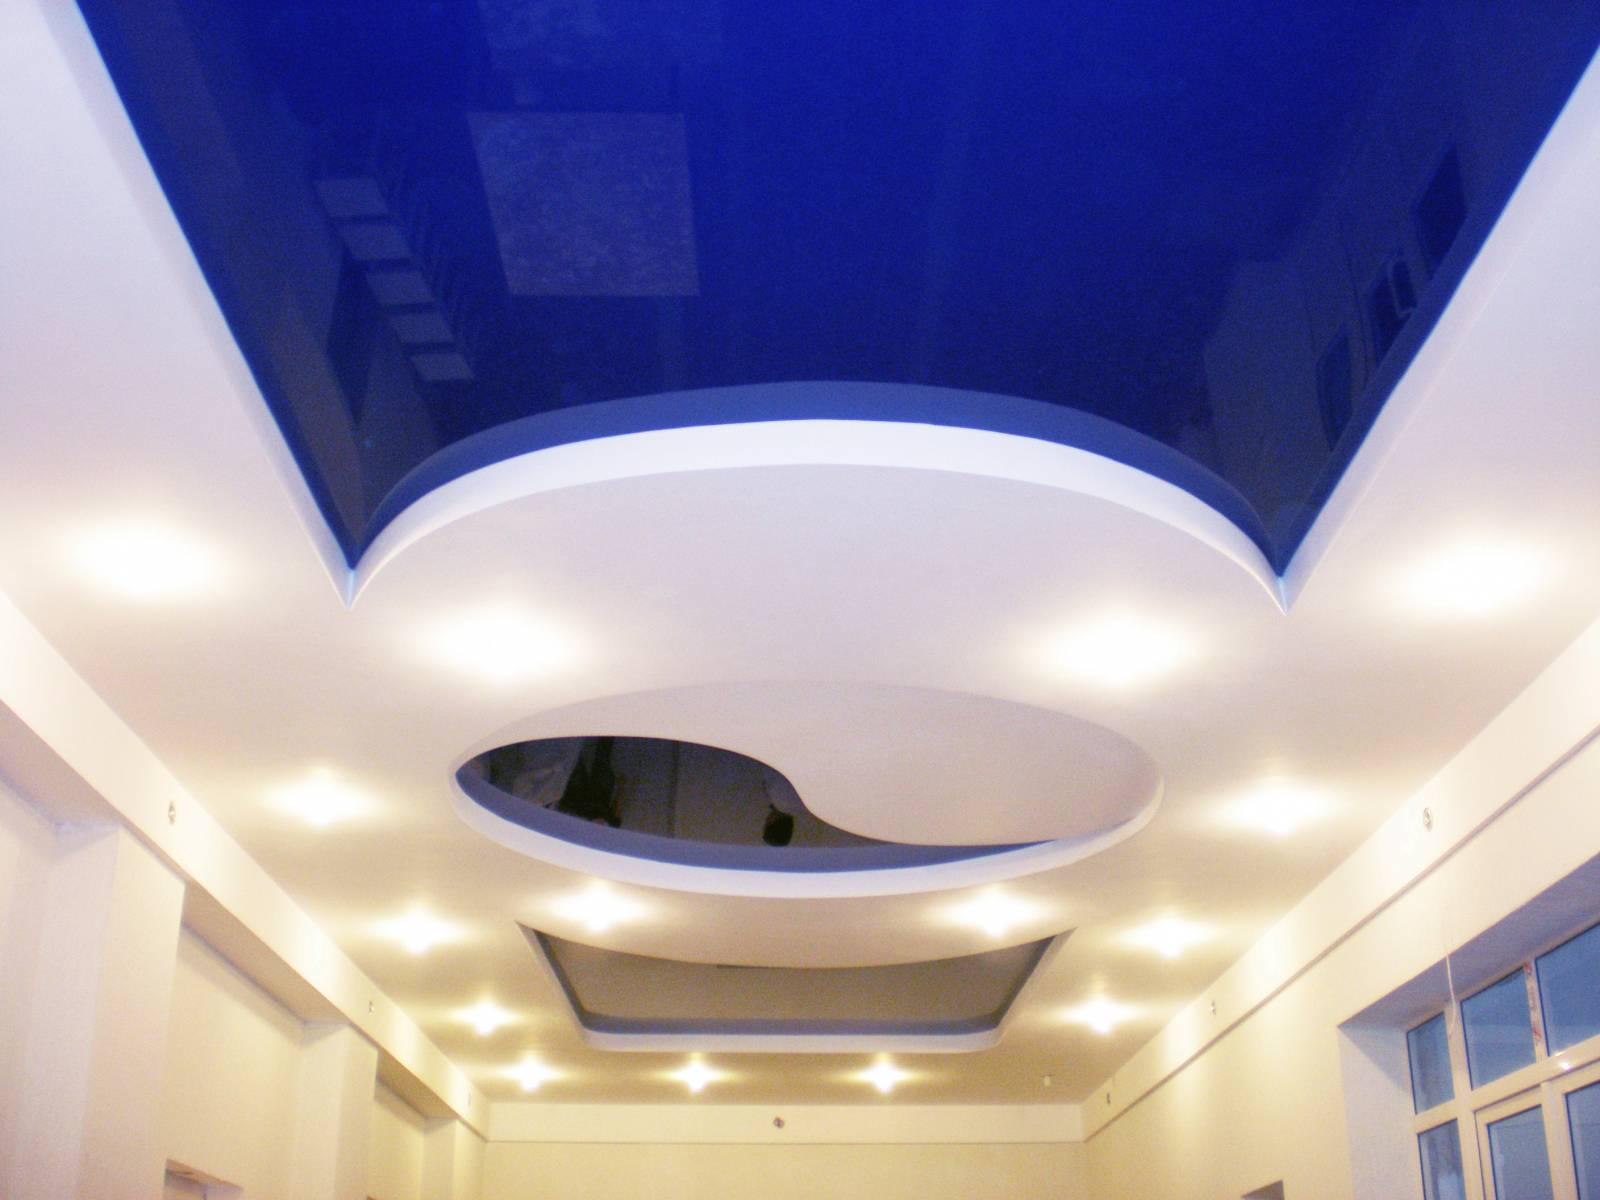 Living room interior with dark blue stretch ceiling